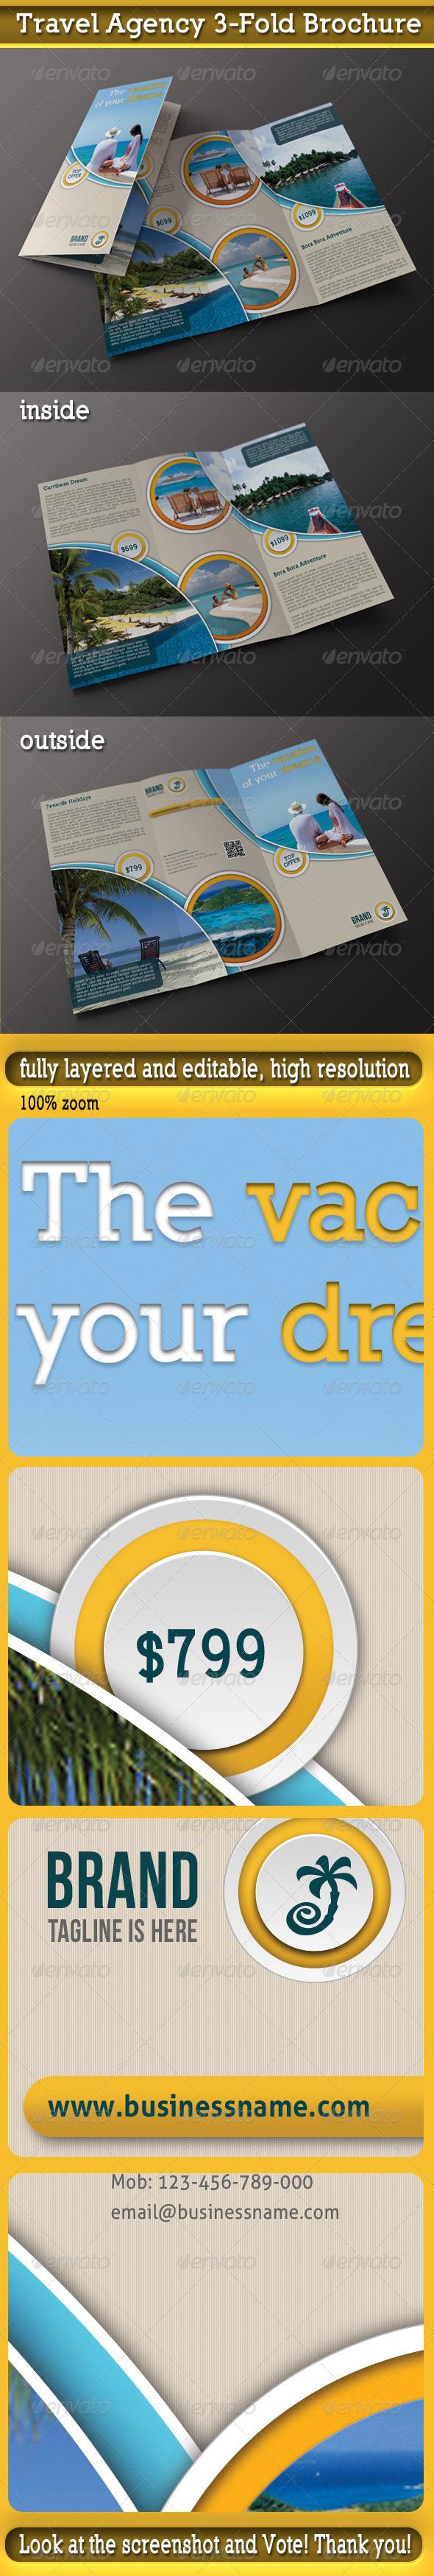 Travel Agency 3-Fold Brochure - Corporate Brochures